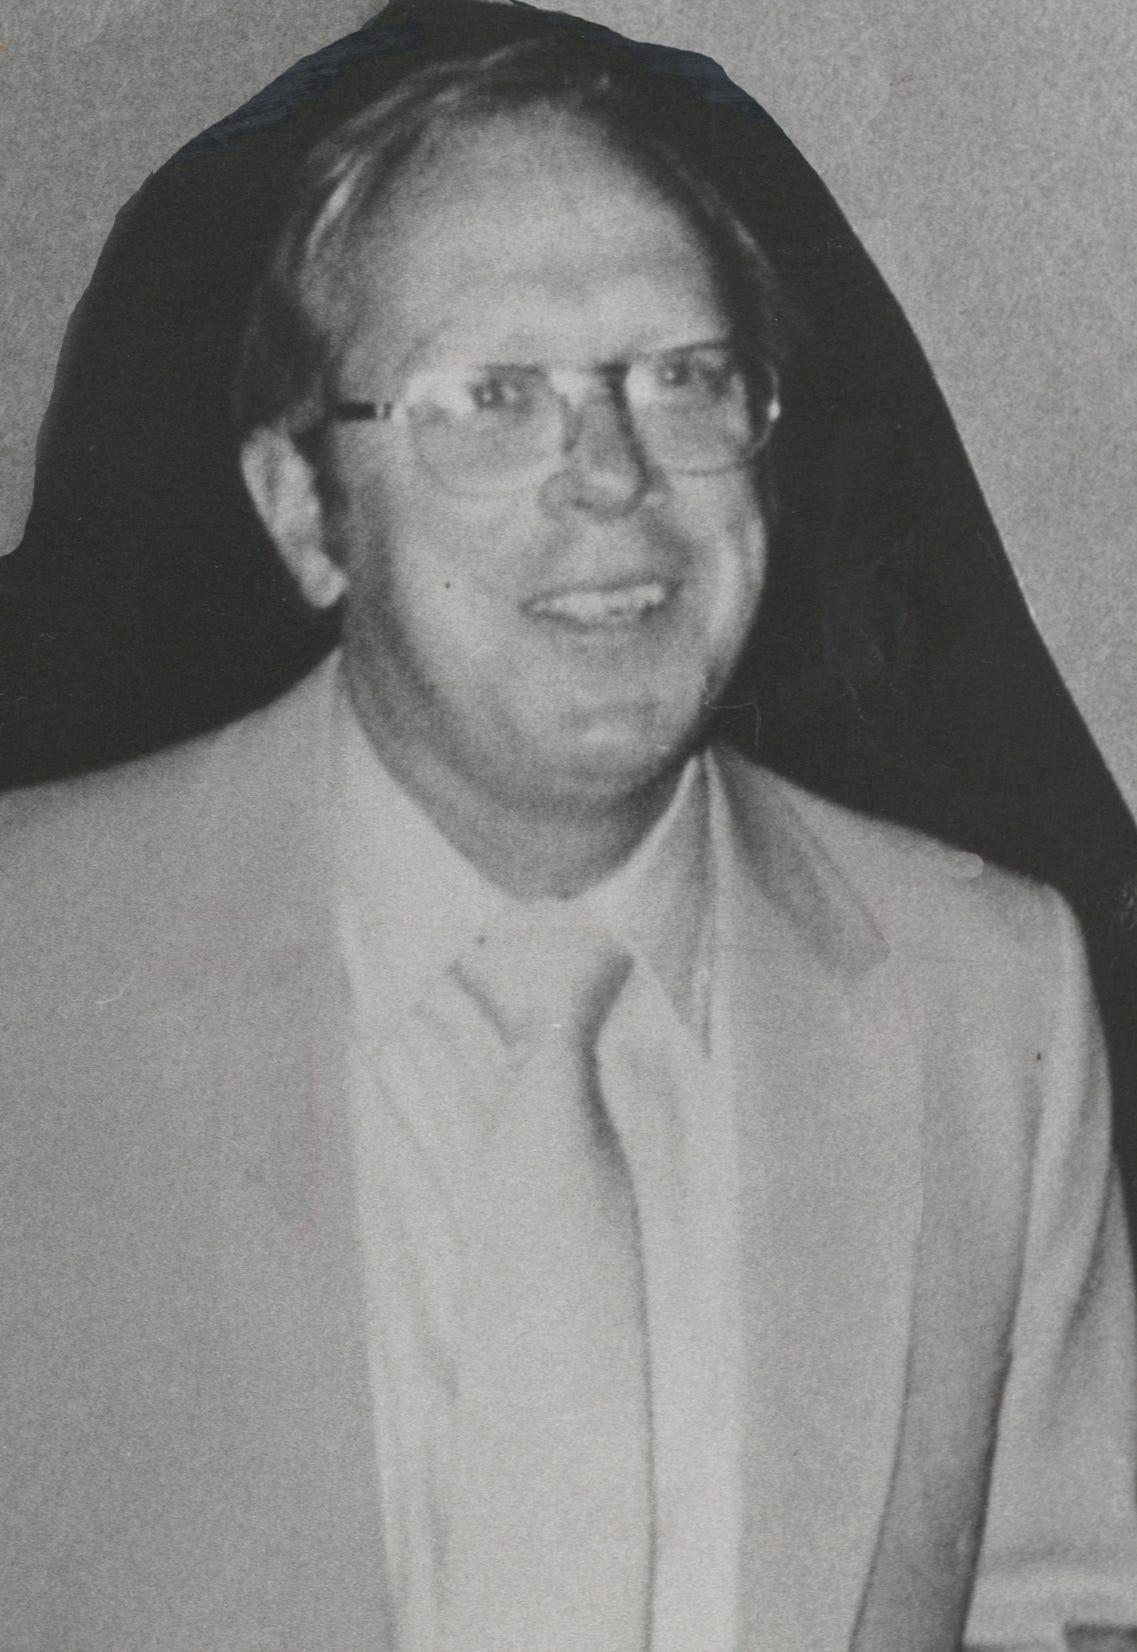 Lloyd White.